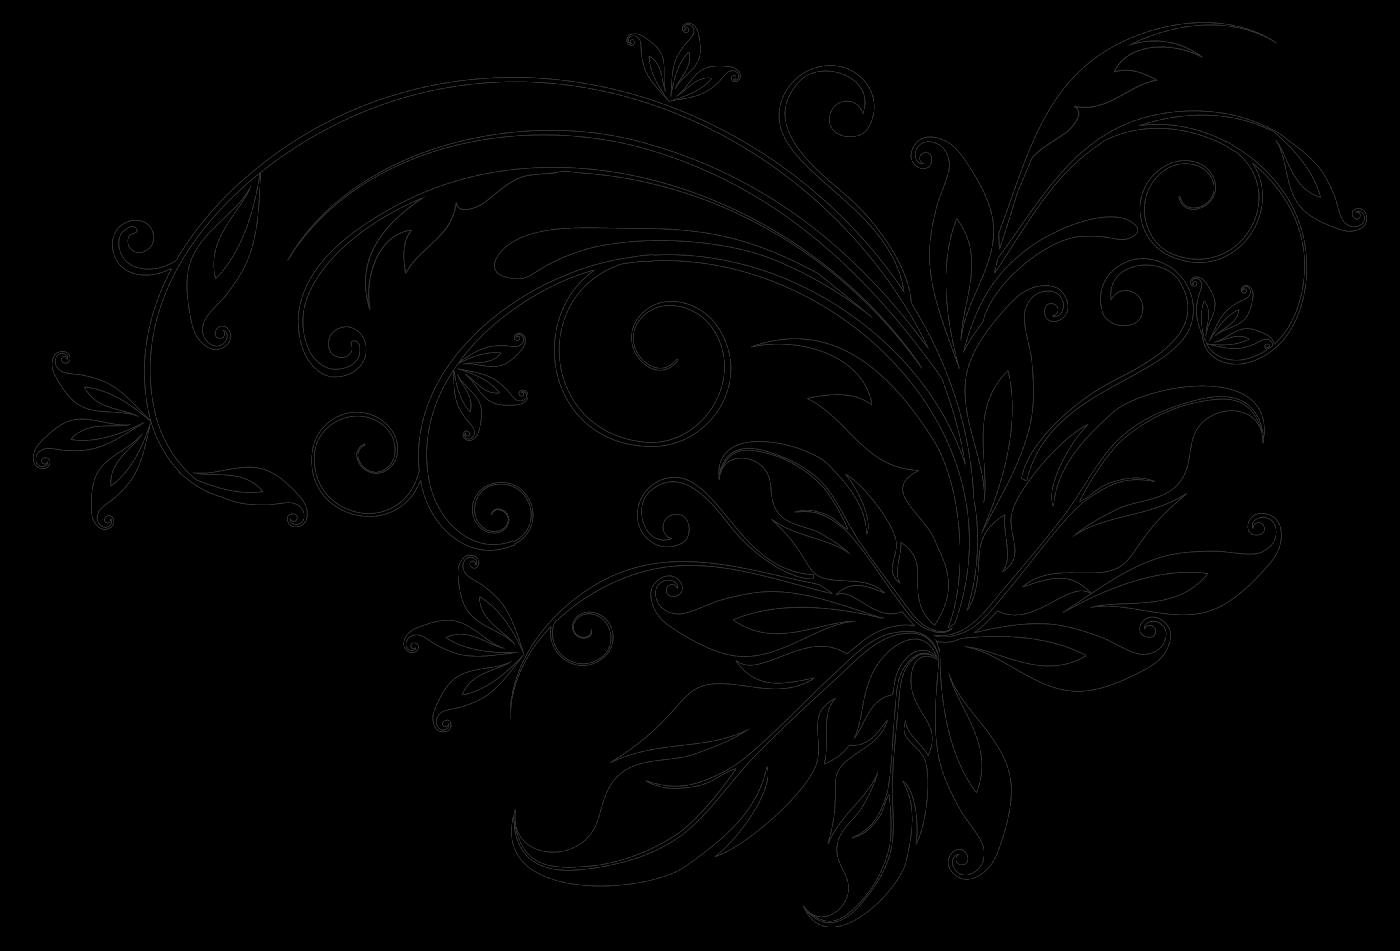 Images of Flower Pattern Png - #rock-cafe